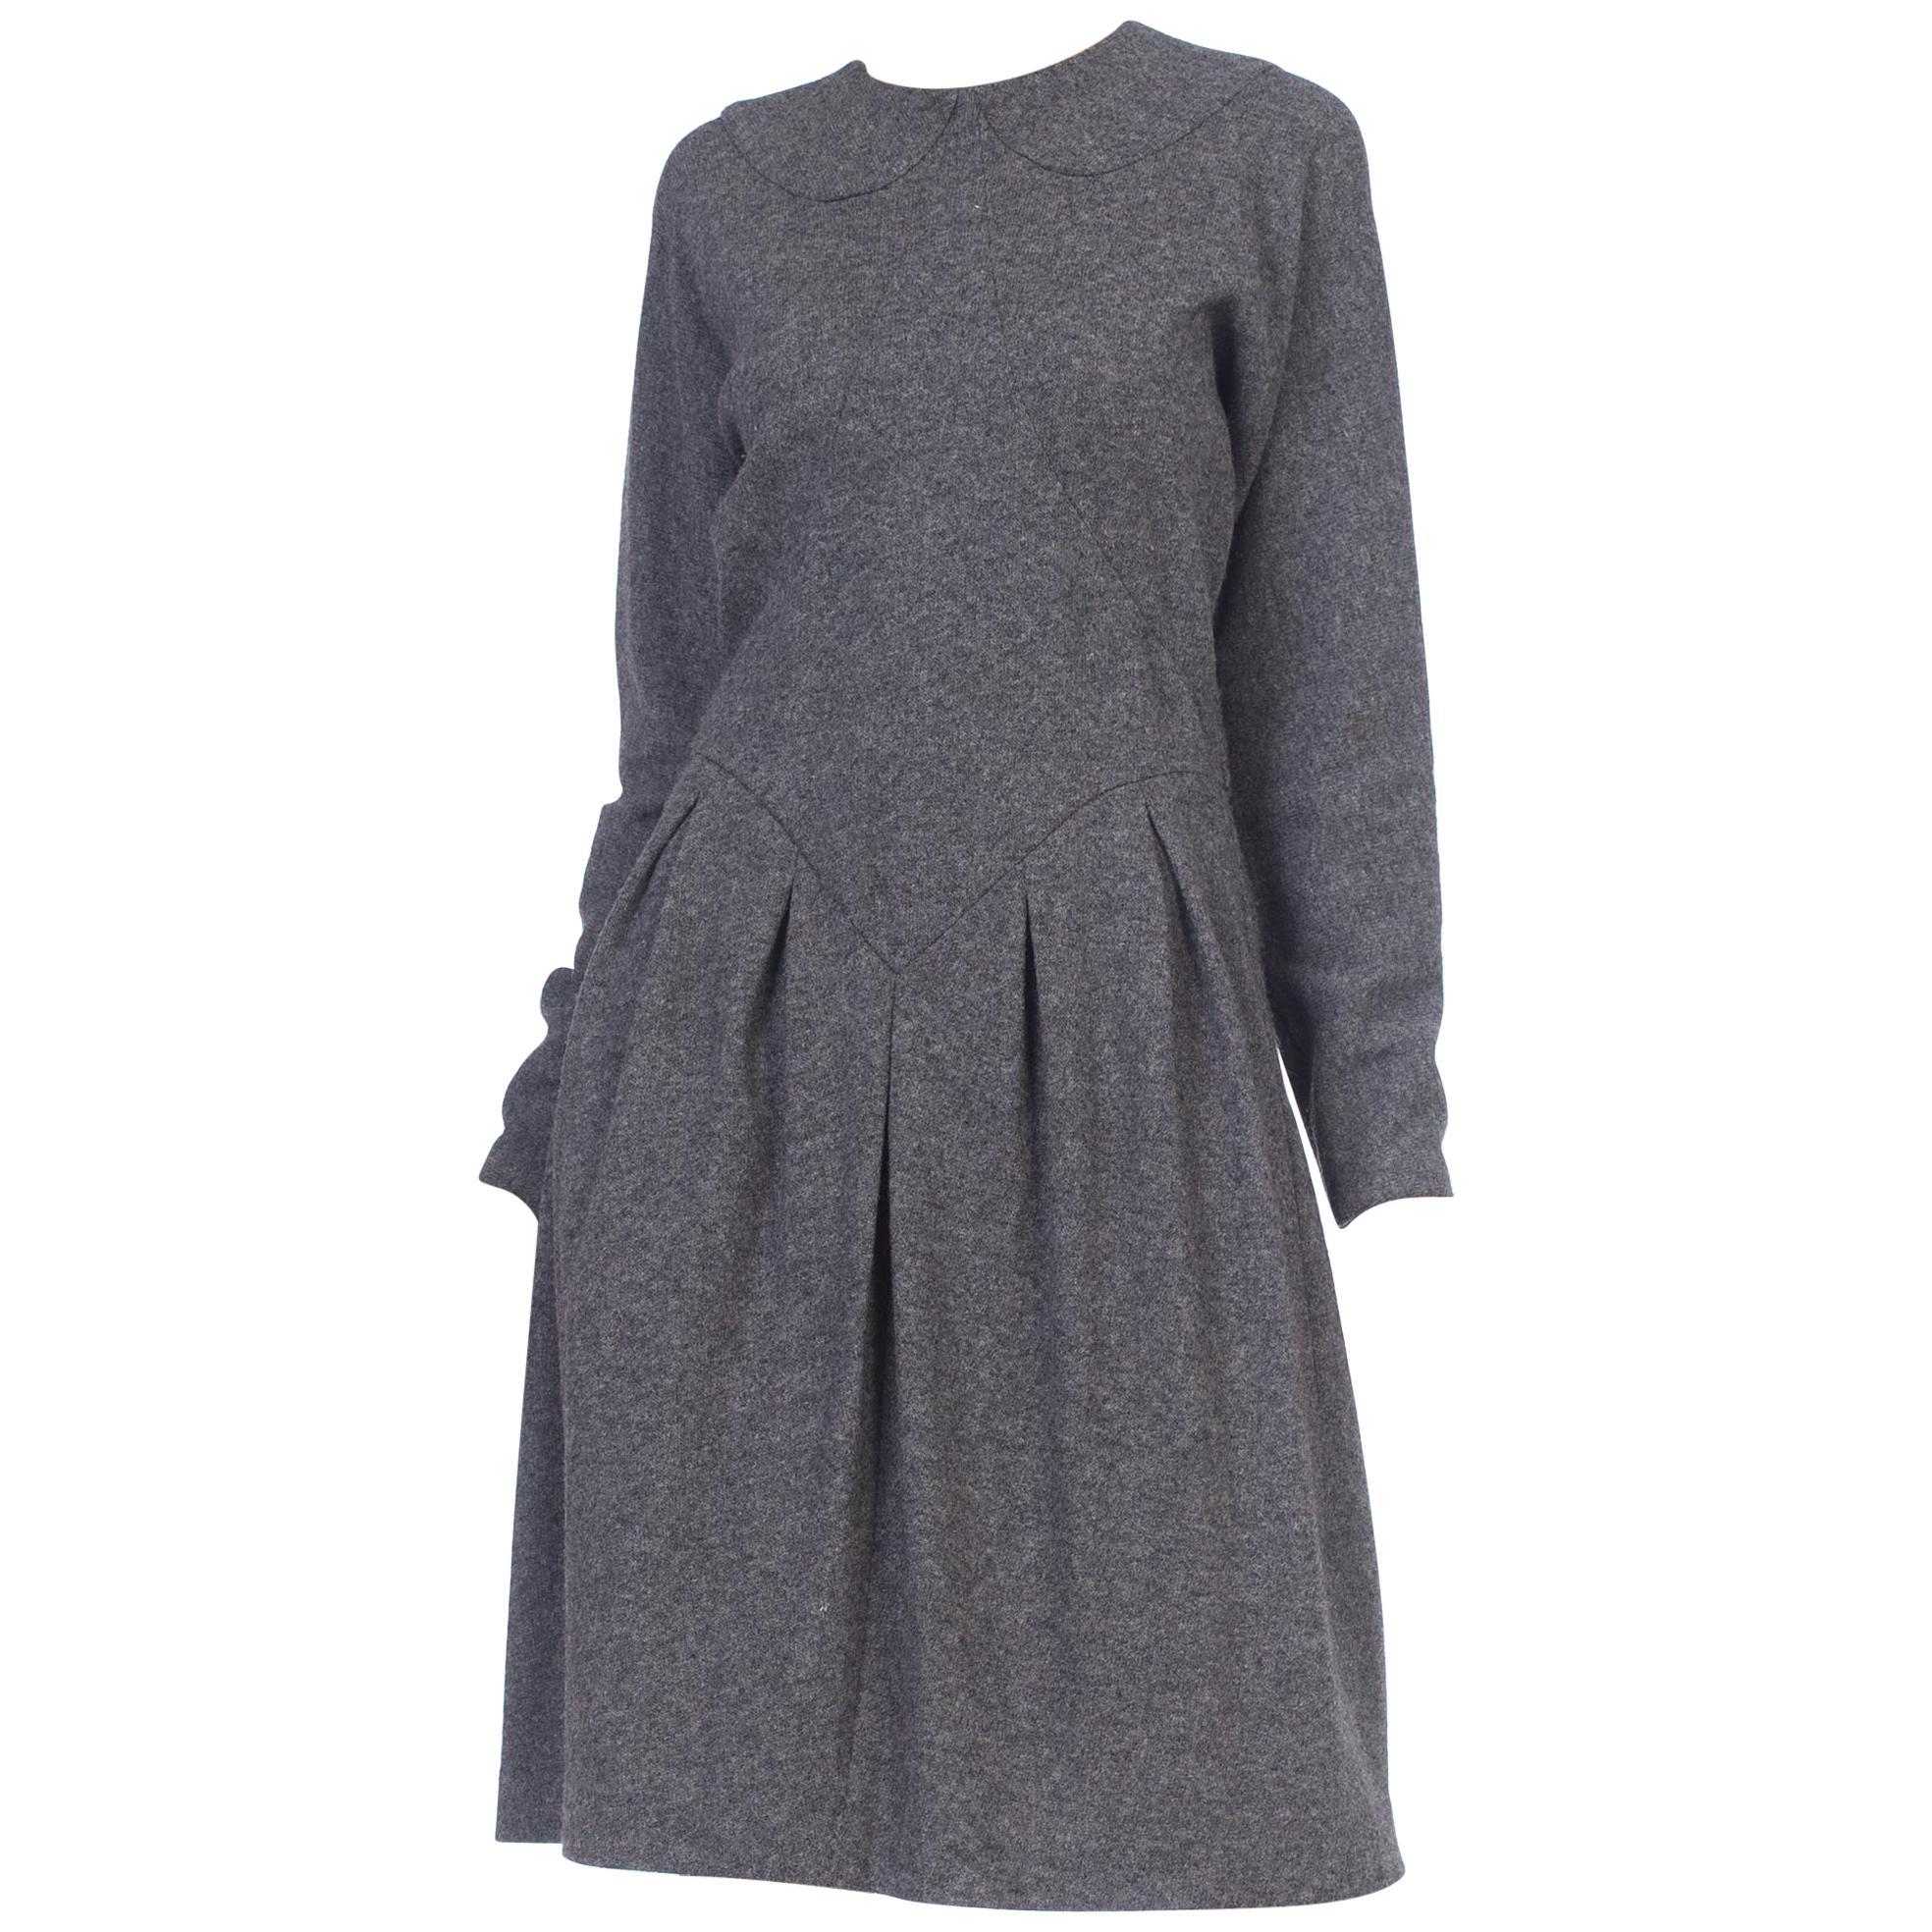 1980S GEOFFREY BEENE Grey Wool Knit Long Sleeve Sweater Dress With Partial Silk